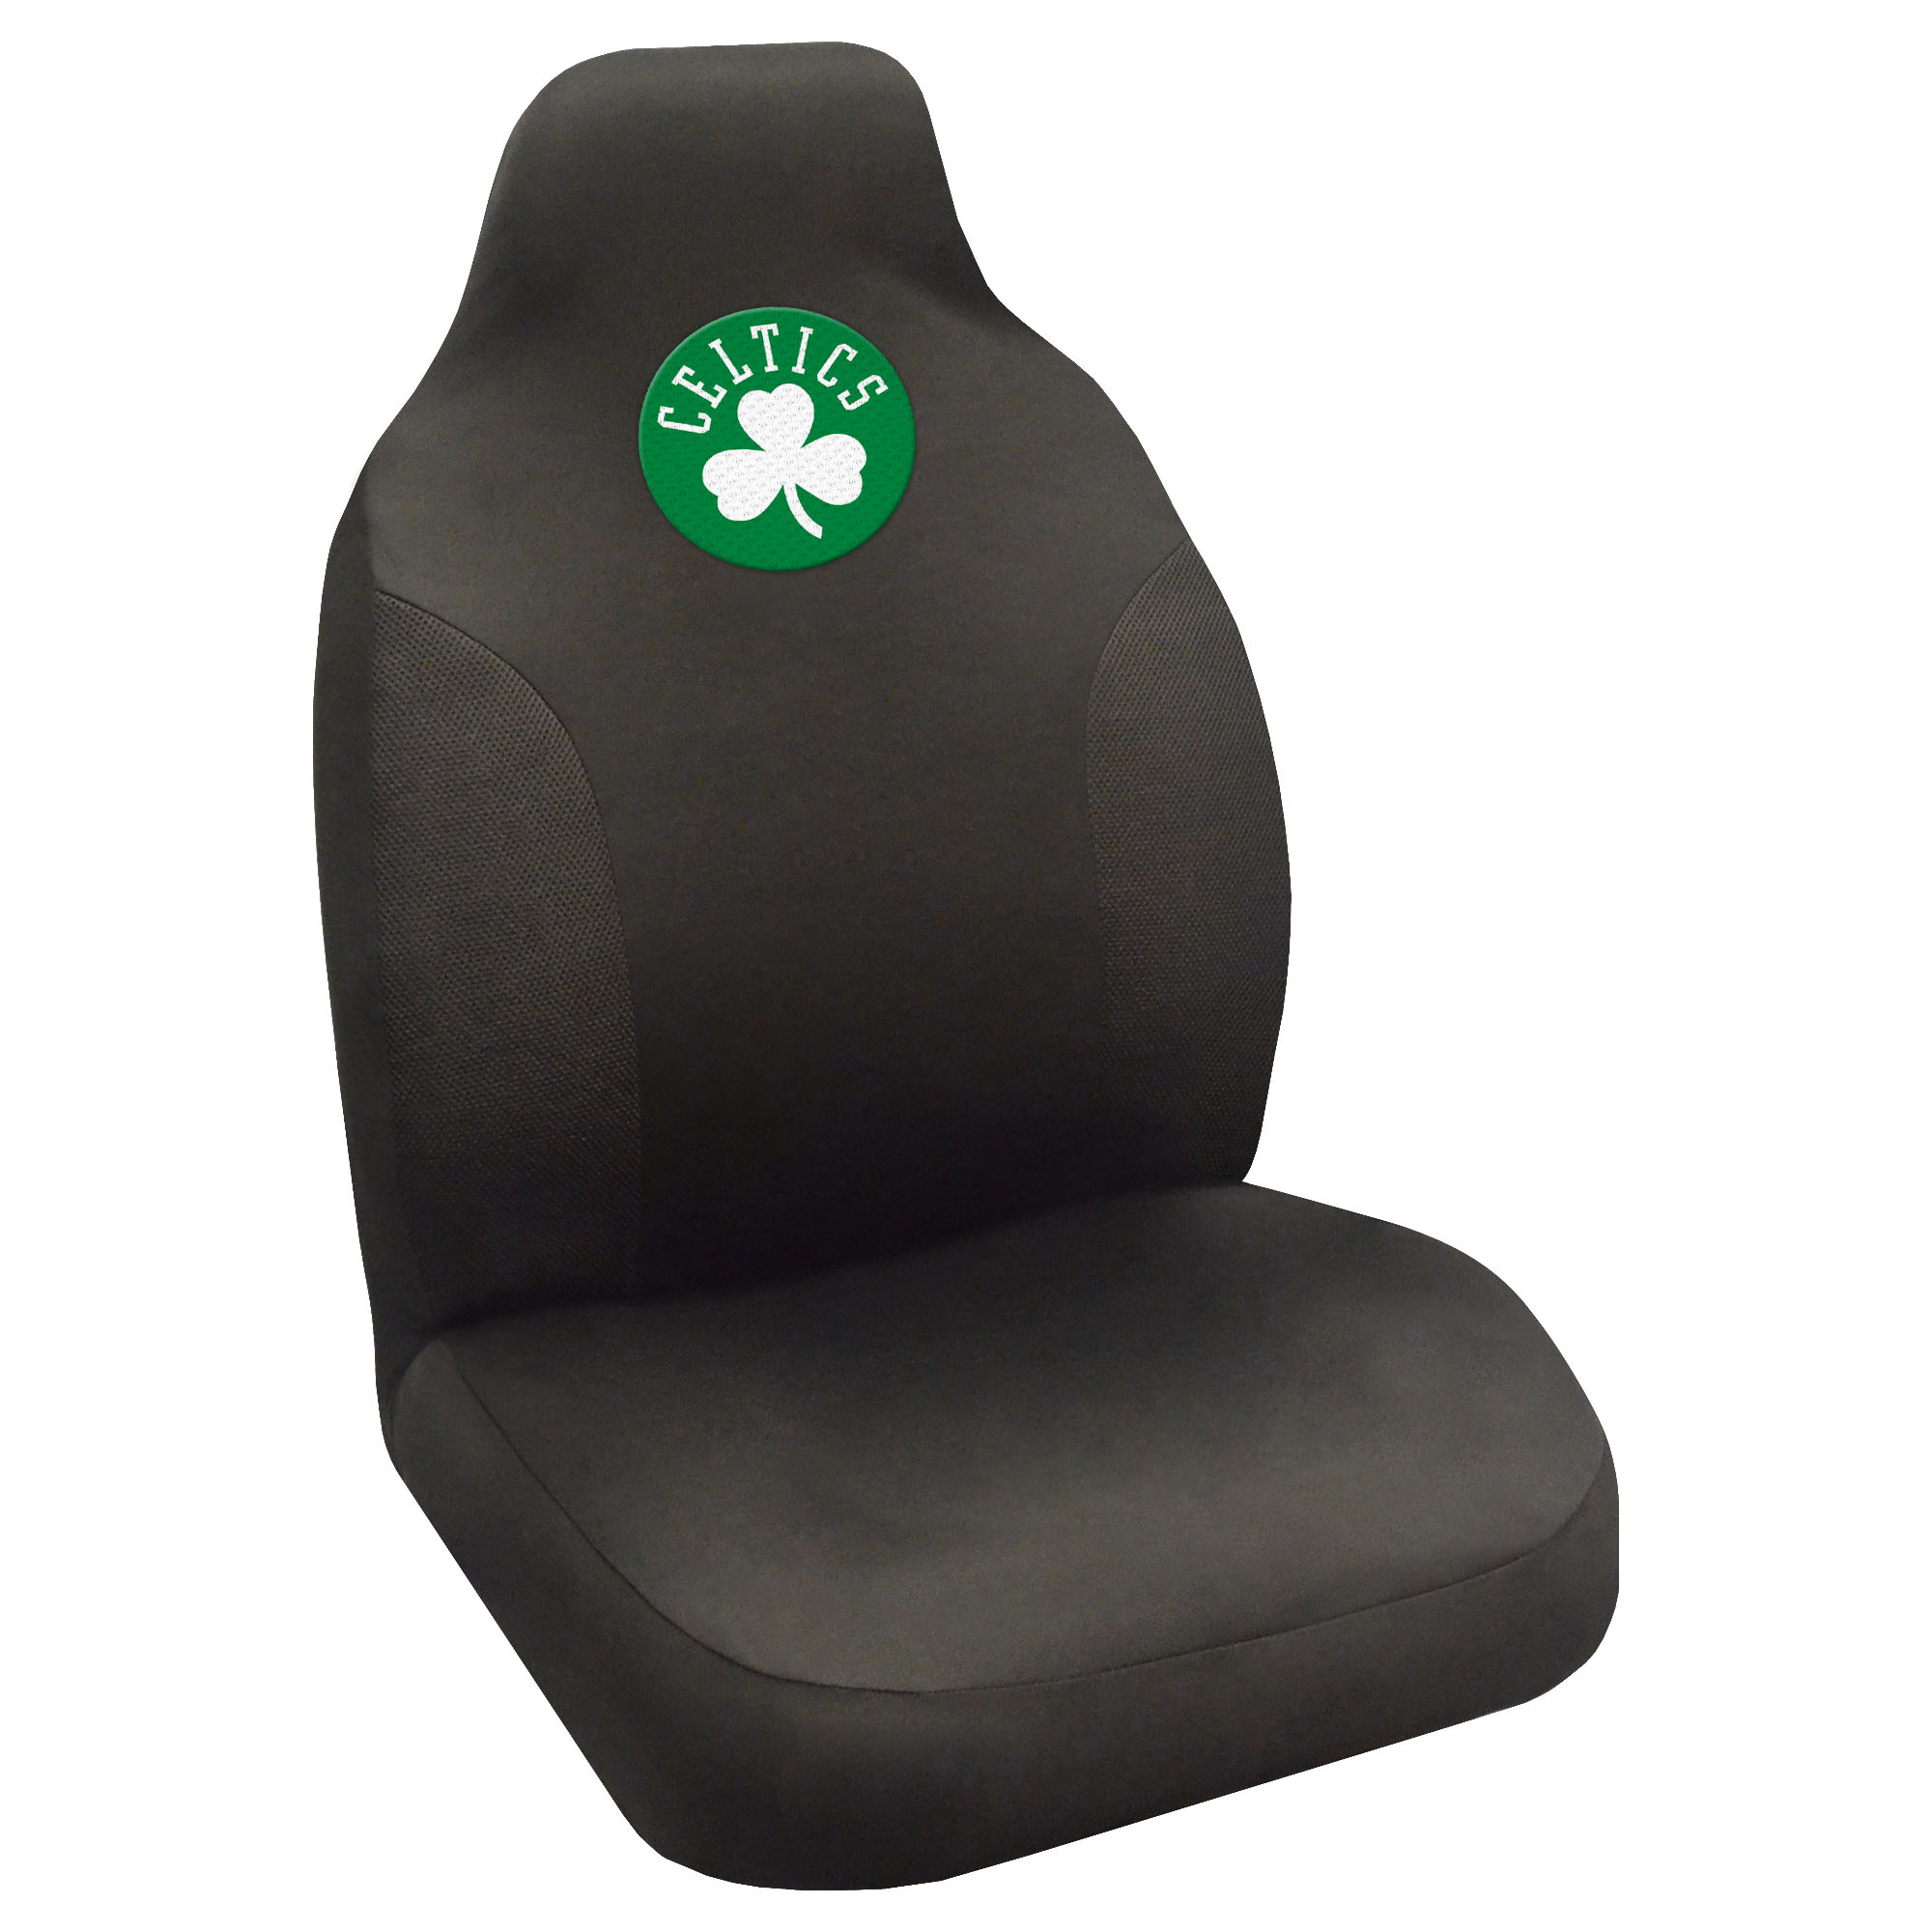 outlet store 0c966 fb353 Boston Celtics Car Seat Cover - No Size - Walmart.com